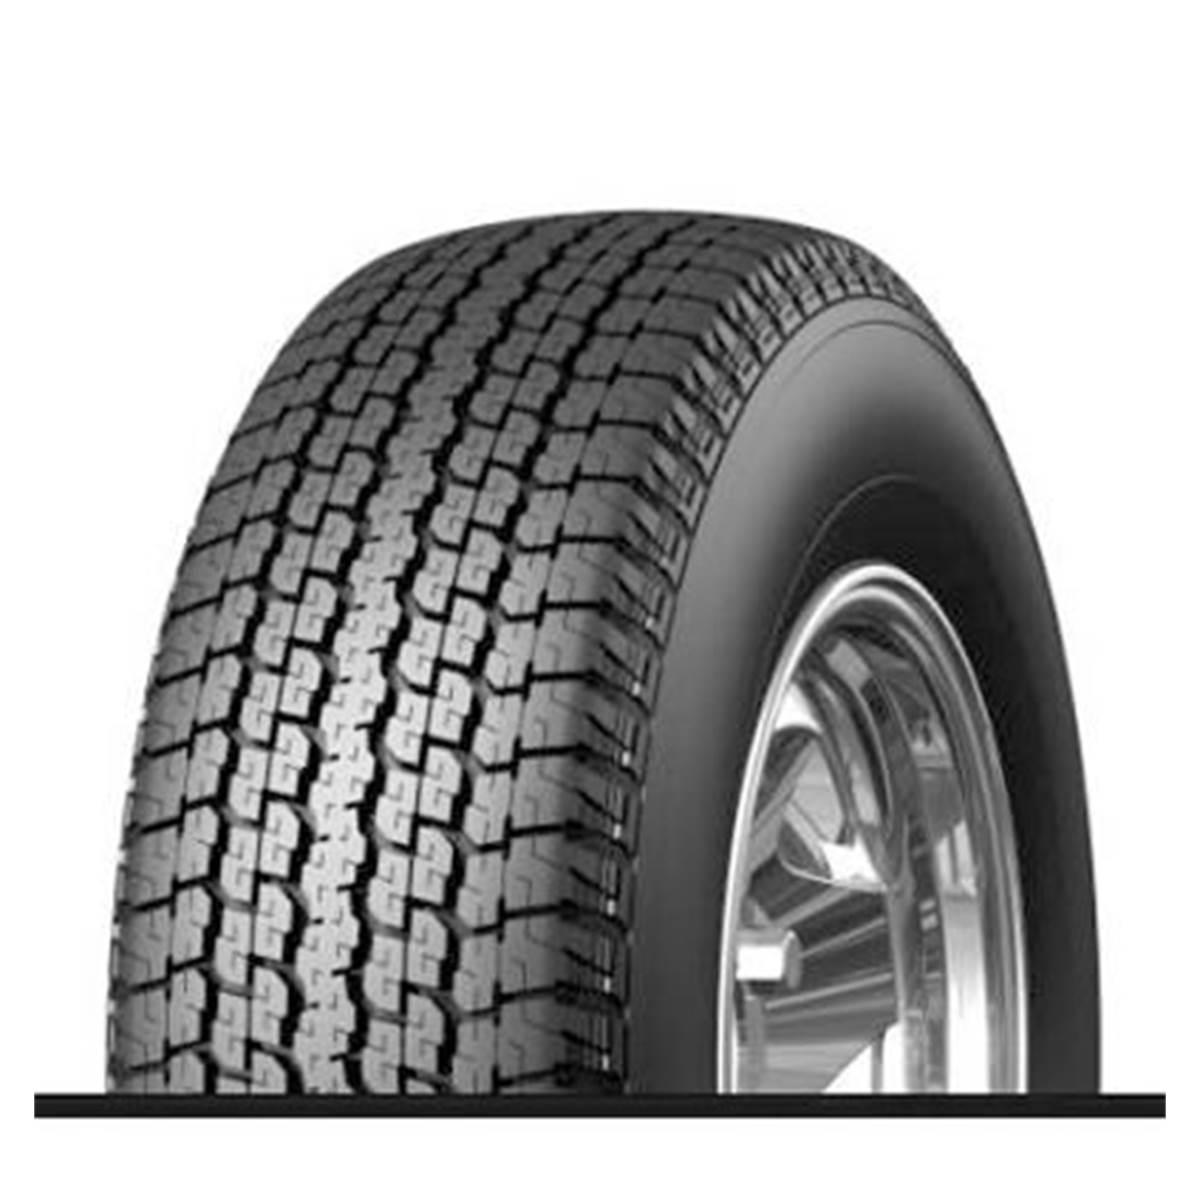 Pneu Bridgestone 265/65X17 112 S DUELER D840